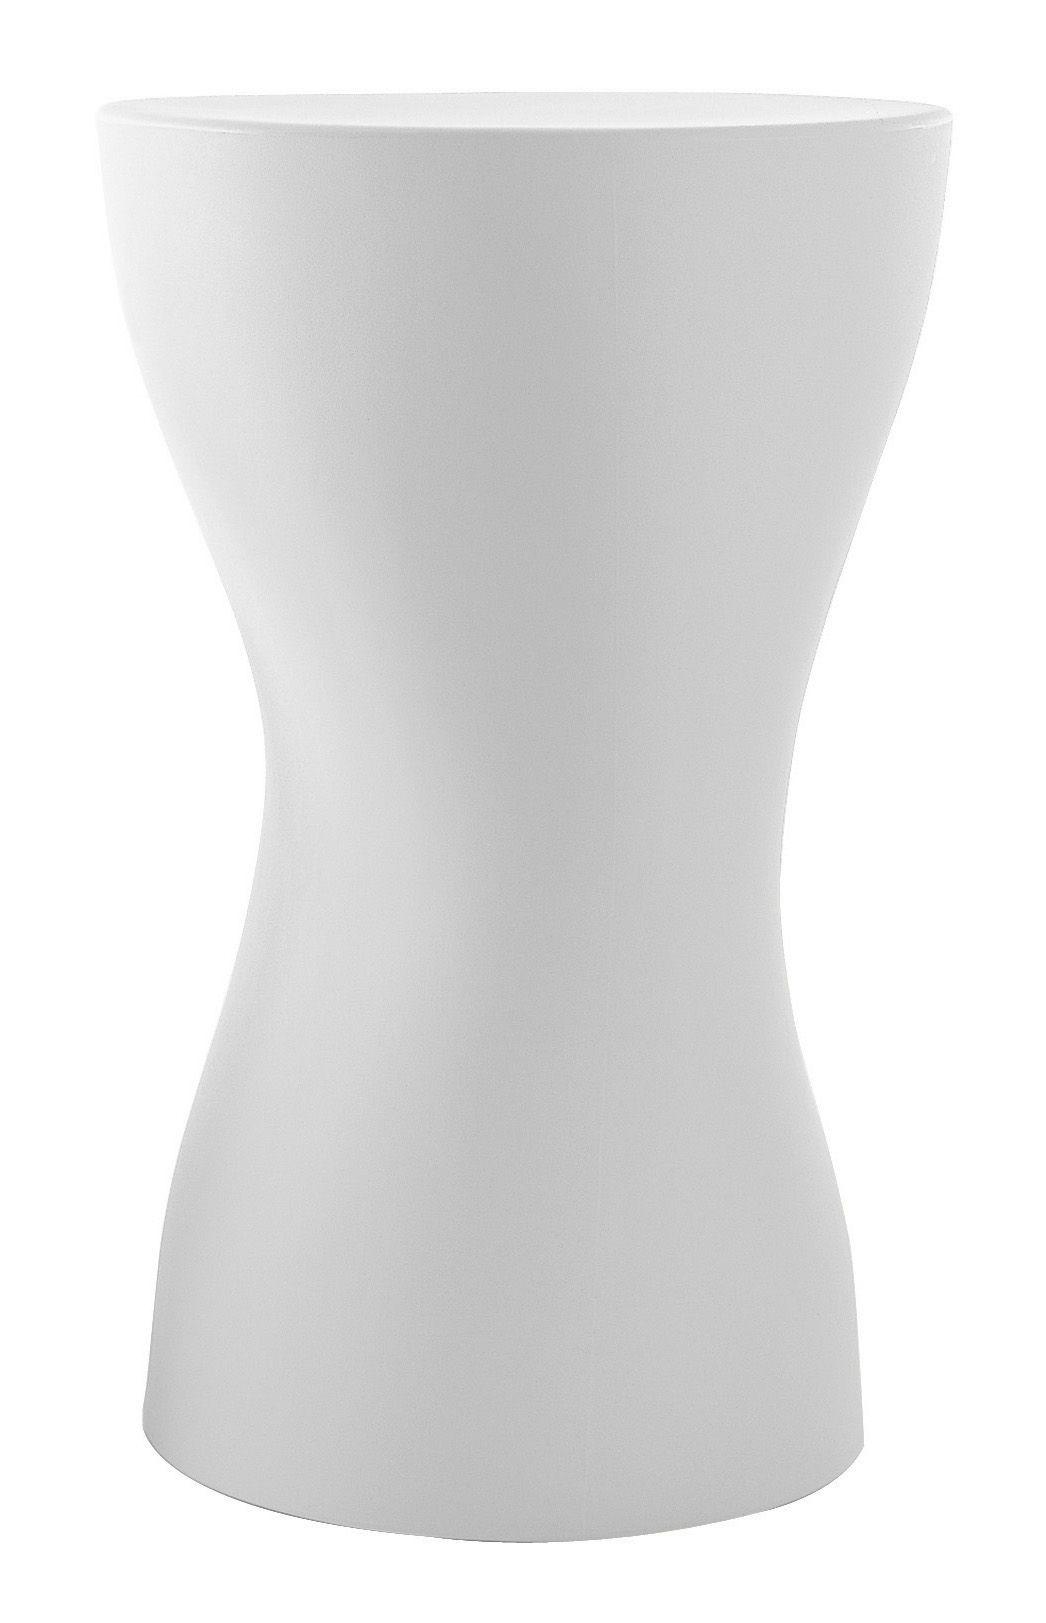 Mobilier - Mange-debout et bars - Mange-debout Tokyo Pop H 90 cm - Driade - Blanc - Polyéthylène